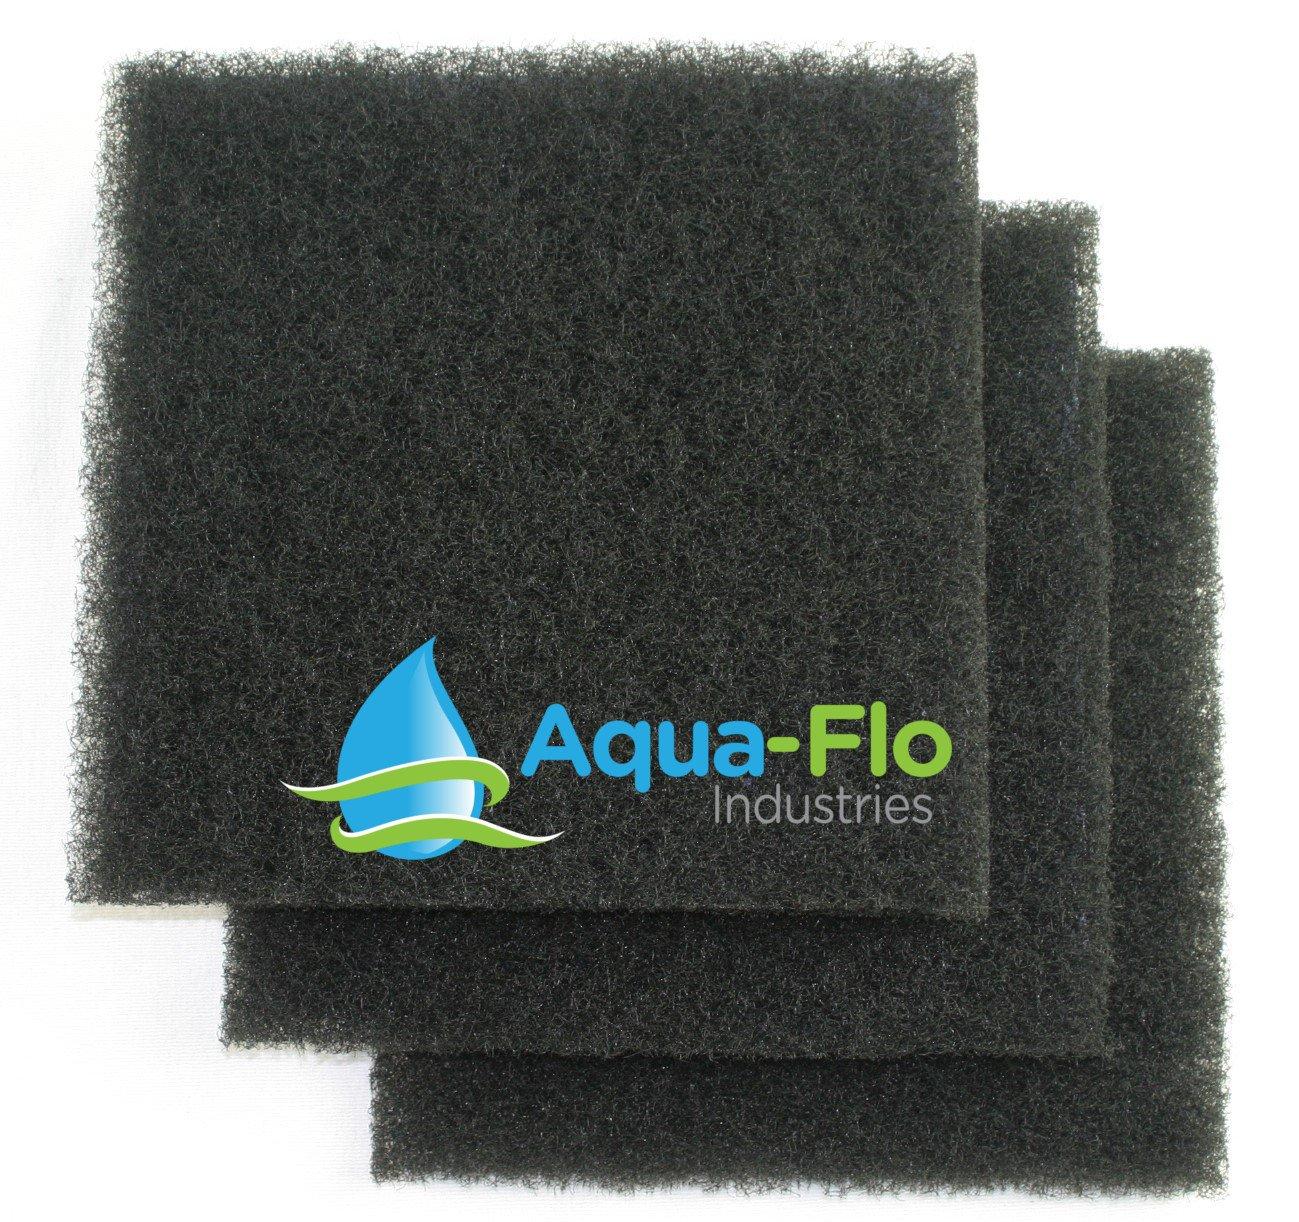 12''x 12''x 1.25'' (3 Pack) Aqua-Flo Coarse Black Universal Pond Filter Mat